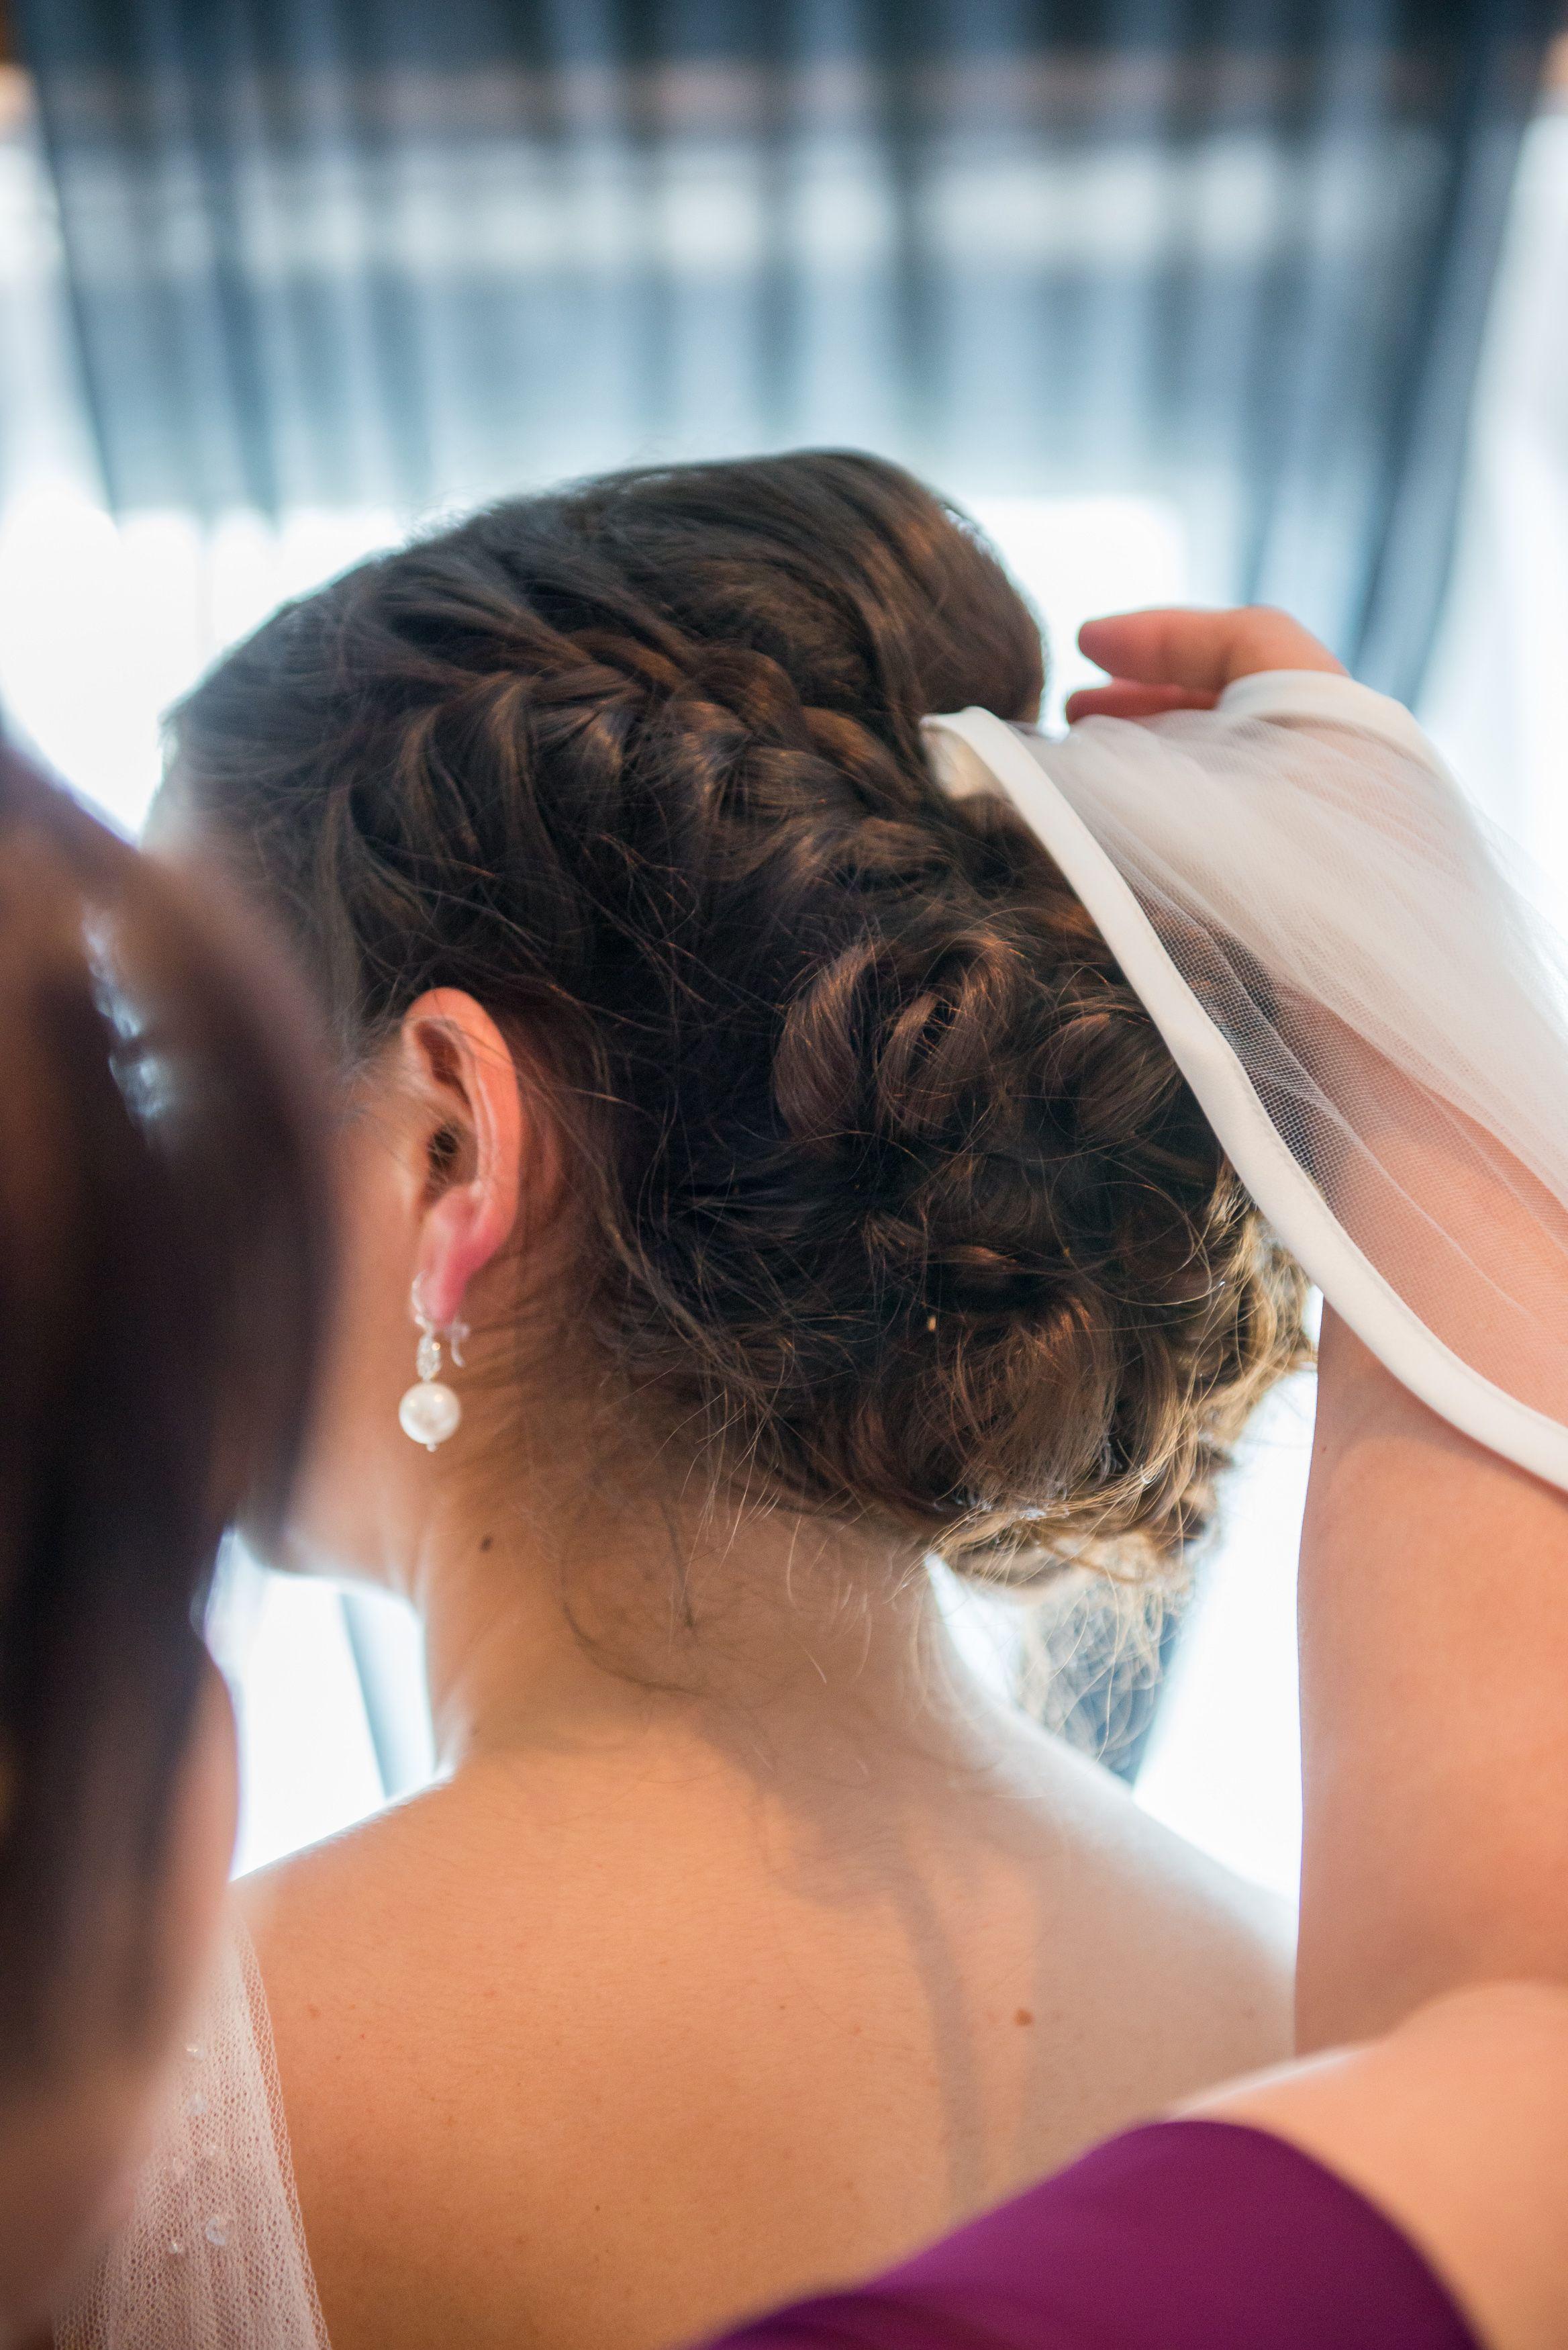 Brautstyling, Hochsteckfrisur, Make-up, Franziska Reise, Franziska